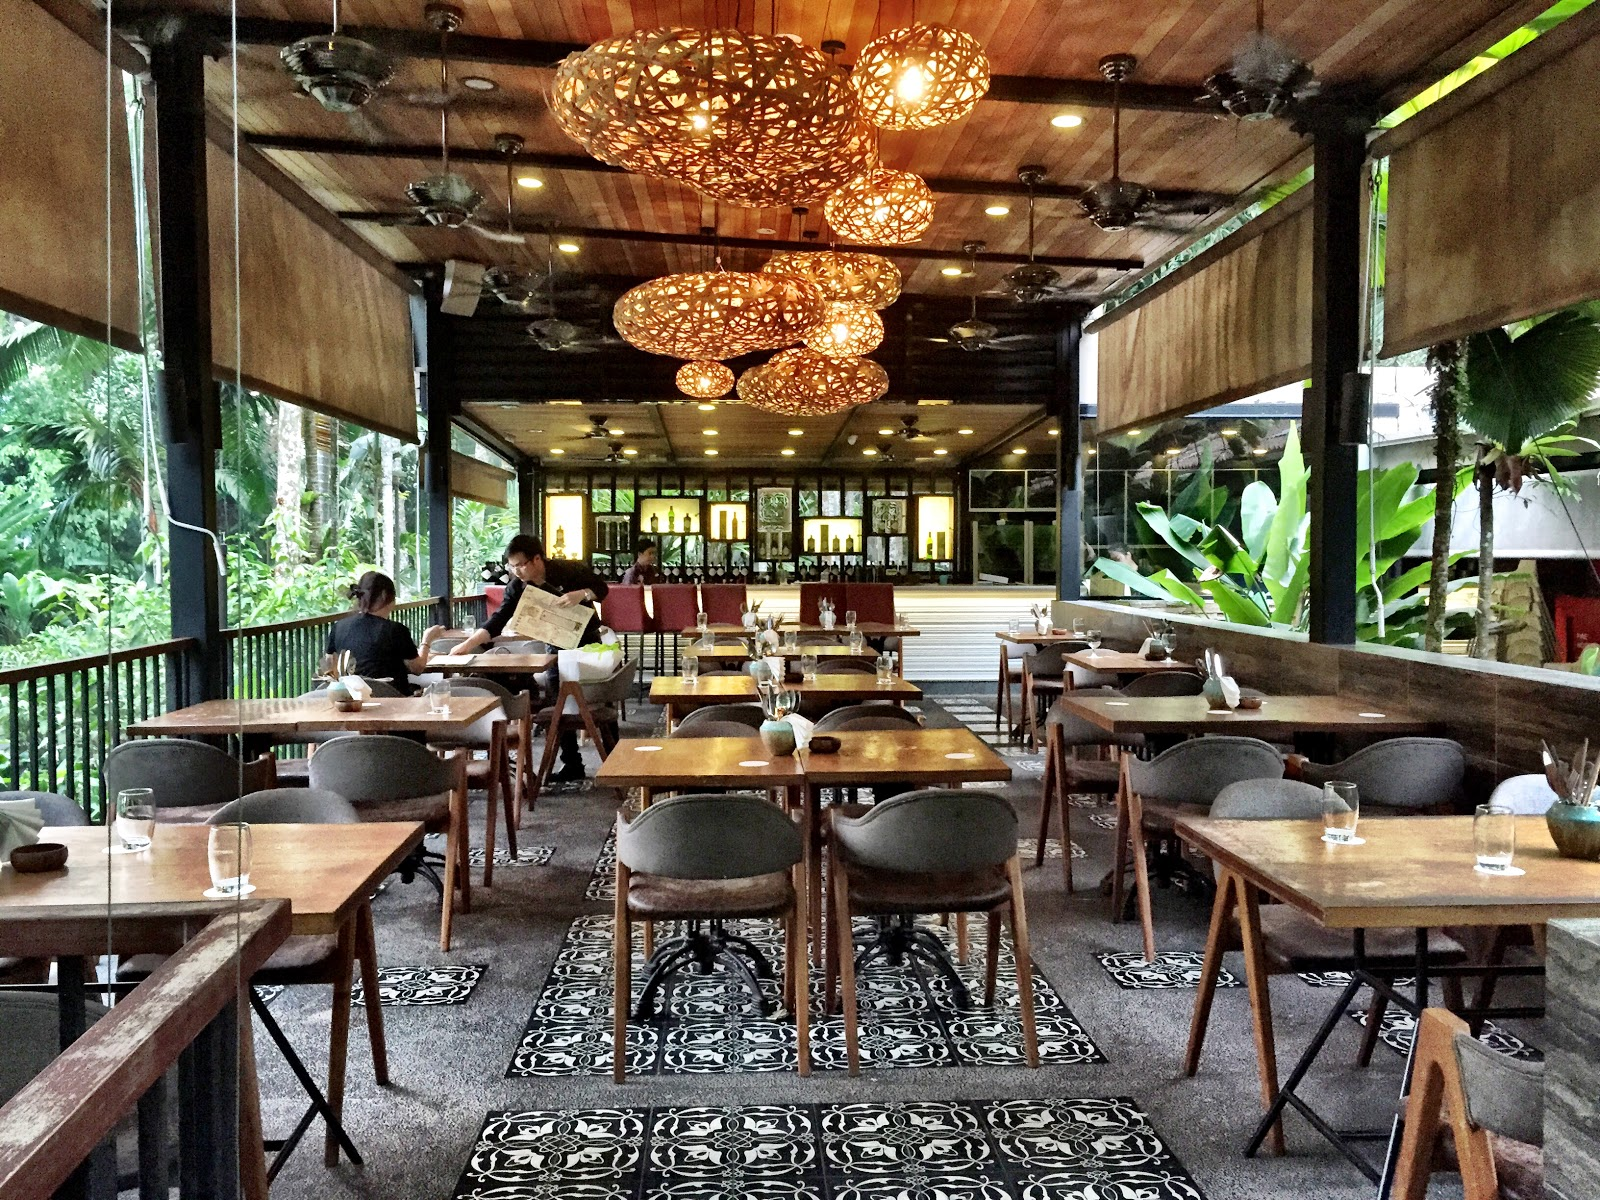 The Silver Chef The Halia At Singapore Botanic Gardens